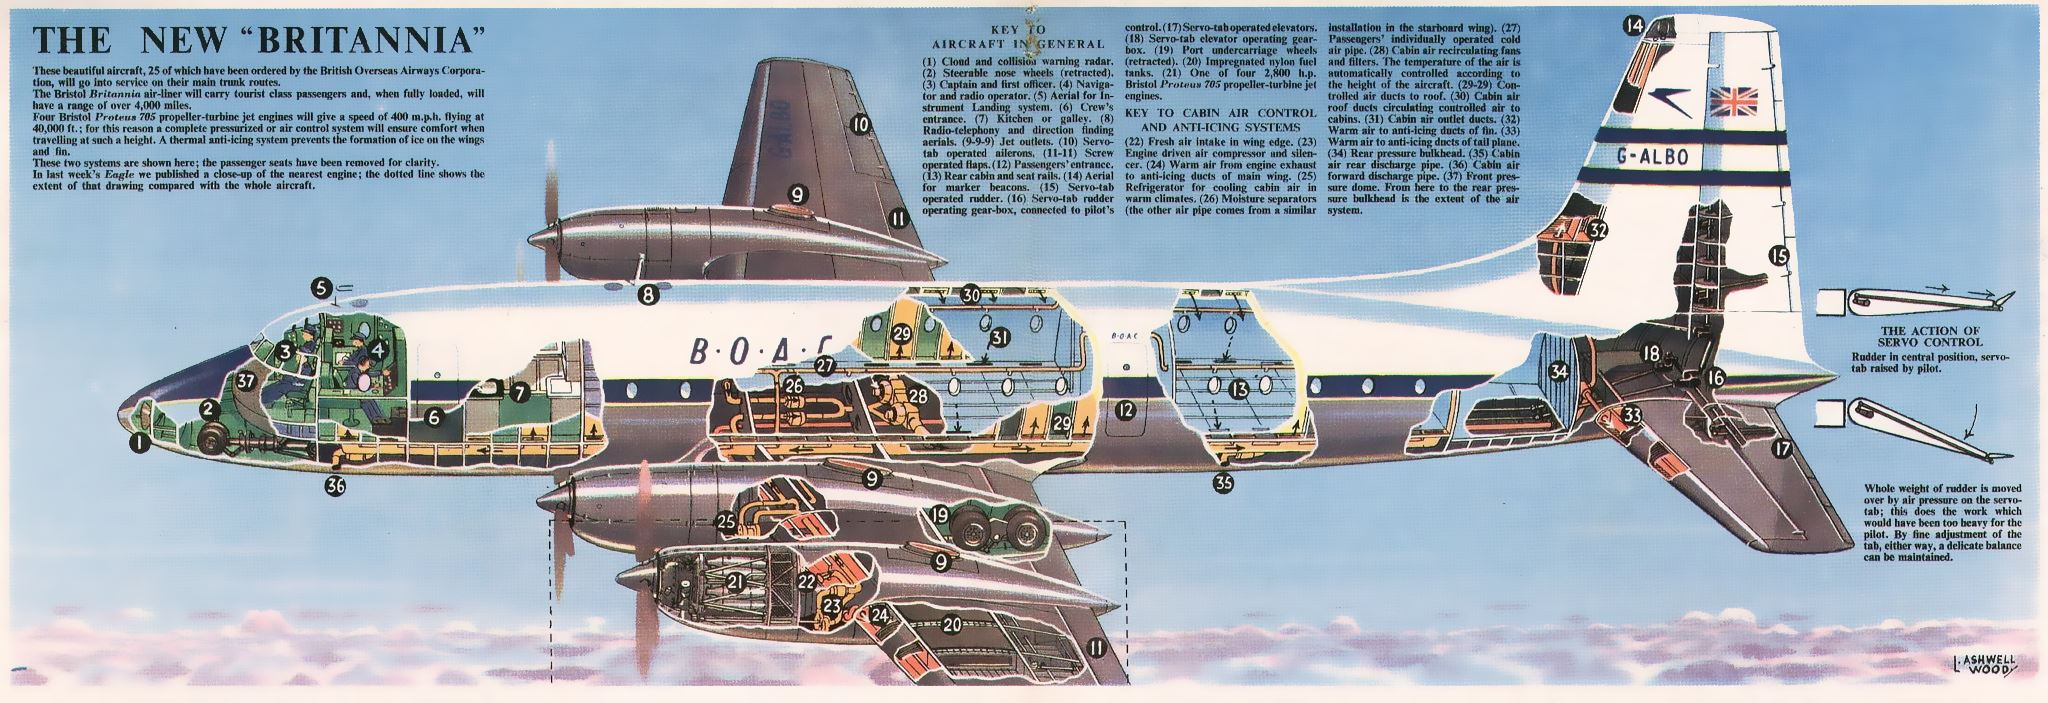 Первый прототип Bristol Britannia G-ALBO